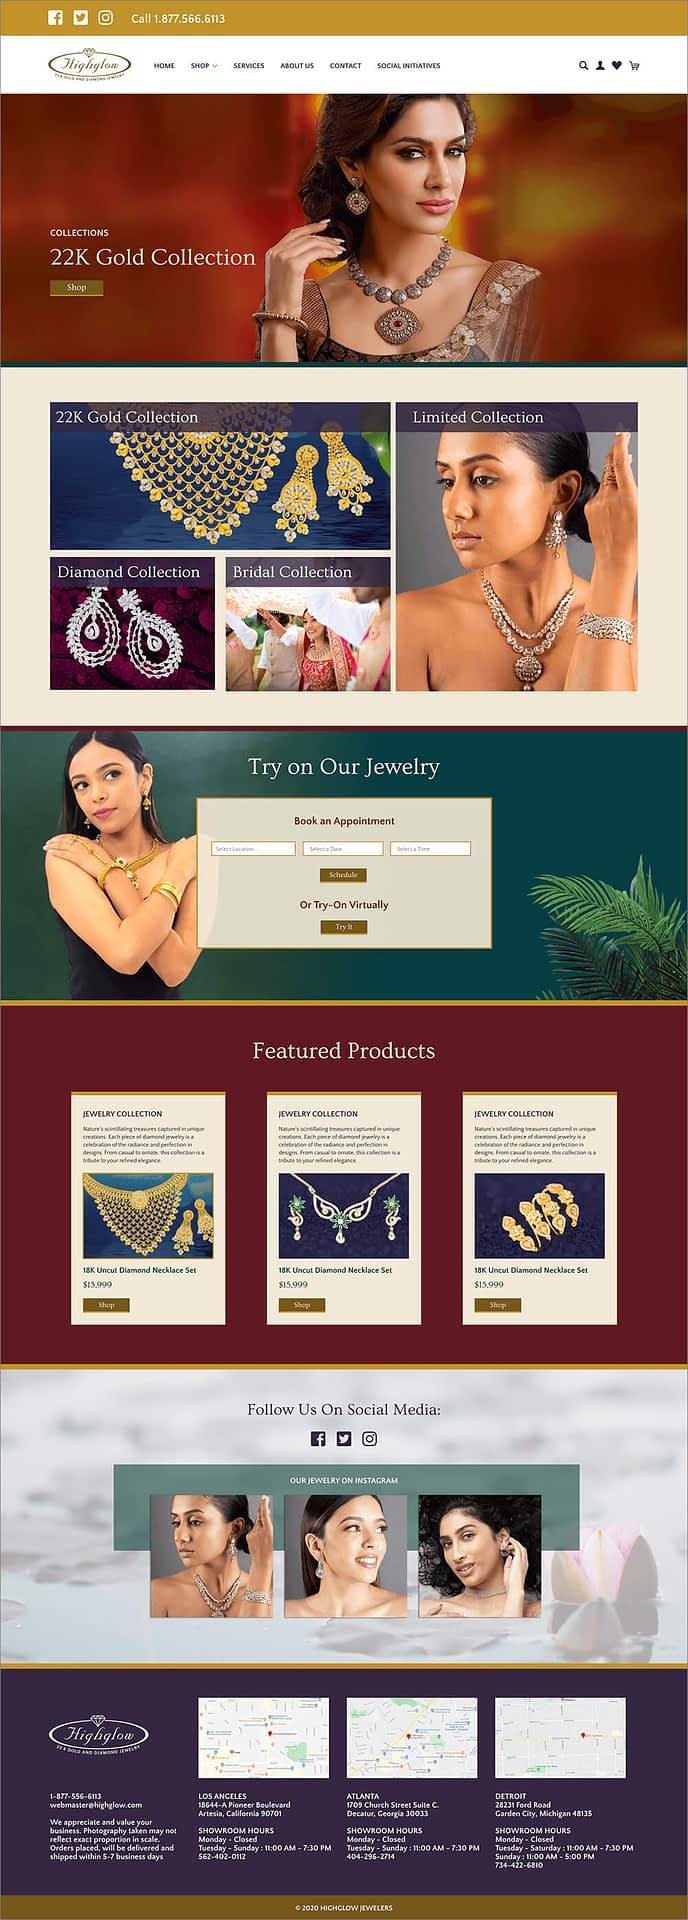 Highglow Jewelers Shopify Homepage Design